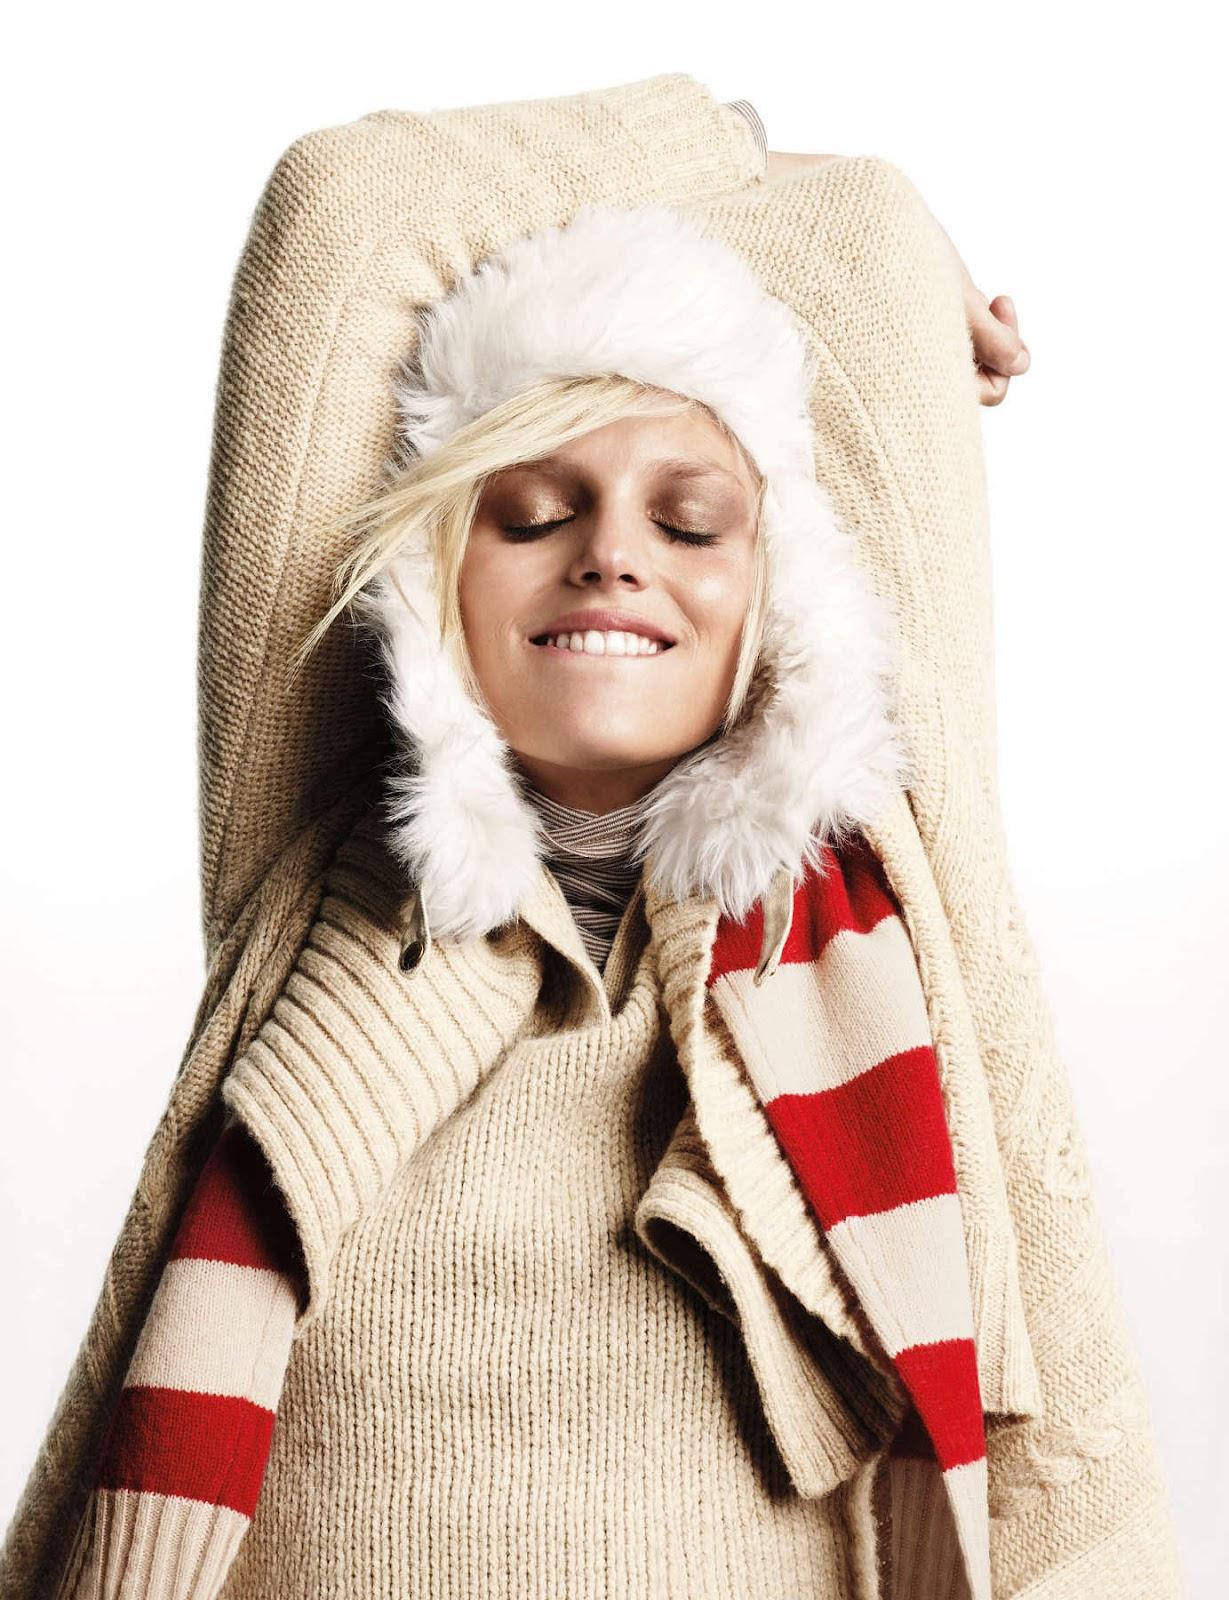 http://3.bp.blogspot.com/-f1XlIZeK5mY/UBX0vNv1QDI/AAAAAAAAF8k/iZWra4Qd57Y/s1600/Anja-Rubik-Smile-Photoshoot.jpg